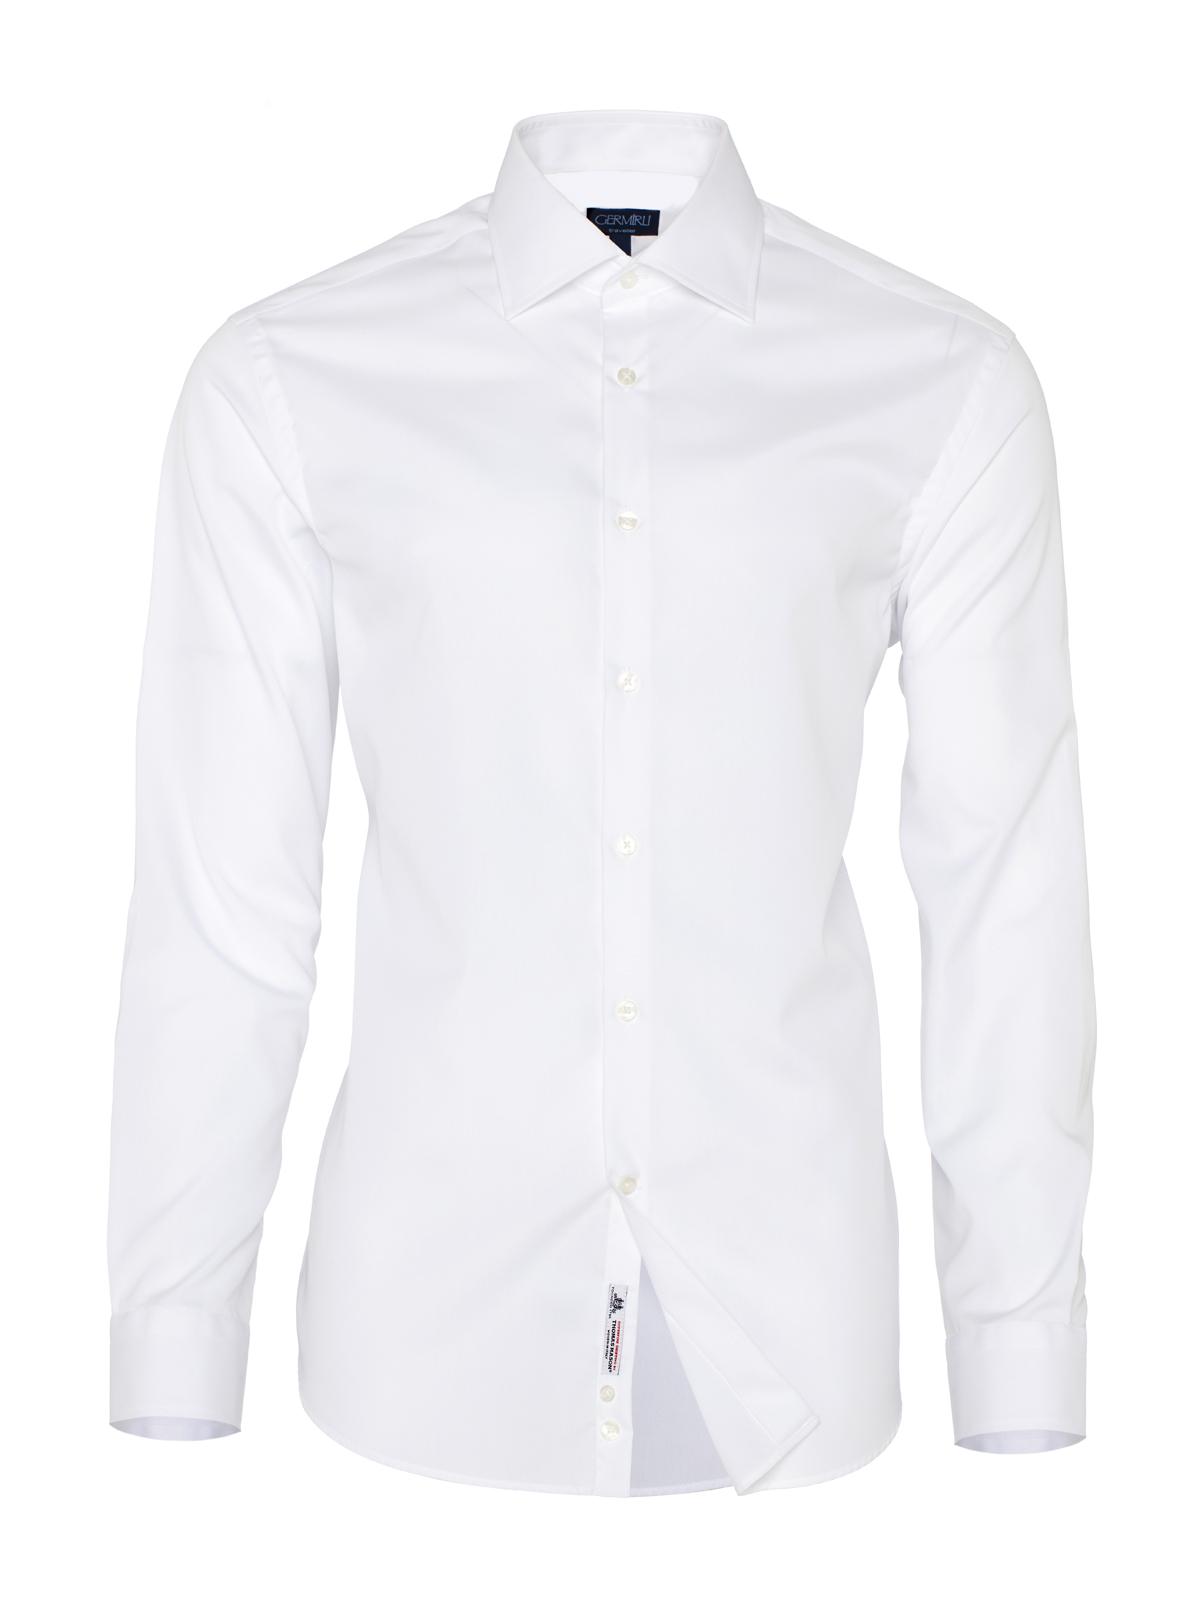 Germirli Non Iron White Oxford Semi Spread Tailor Fit Journey Shirt